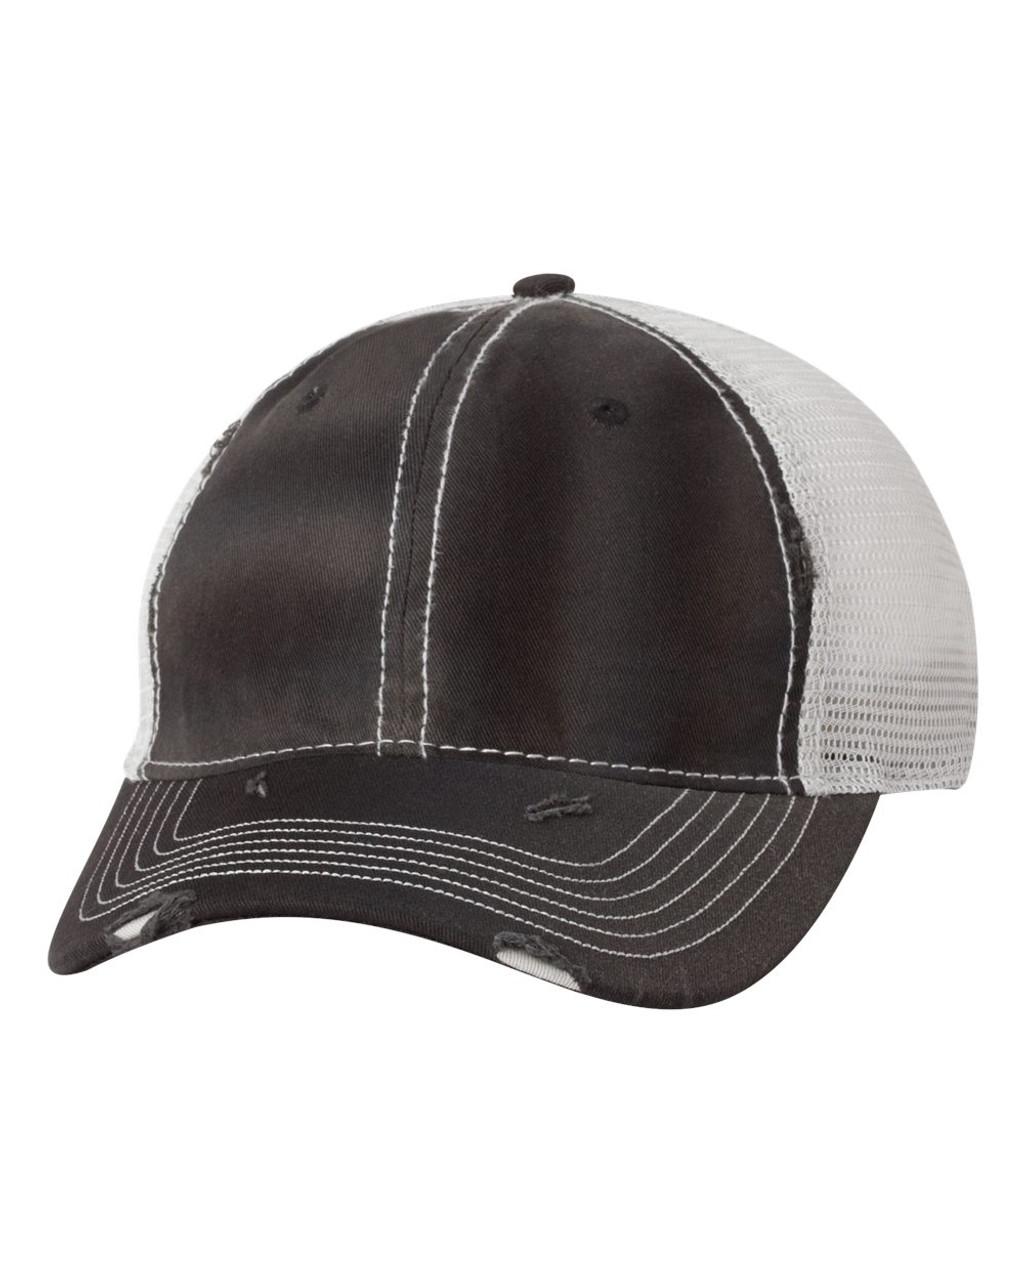 SP3150 Sportsman Dirty-Washed Mesh Cap | T-shirt.ca